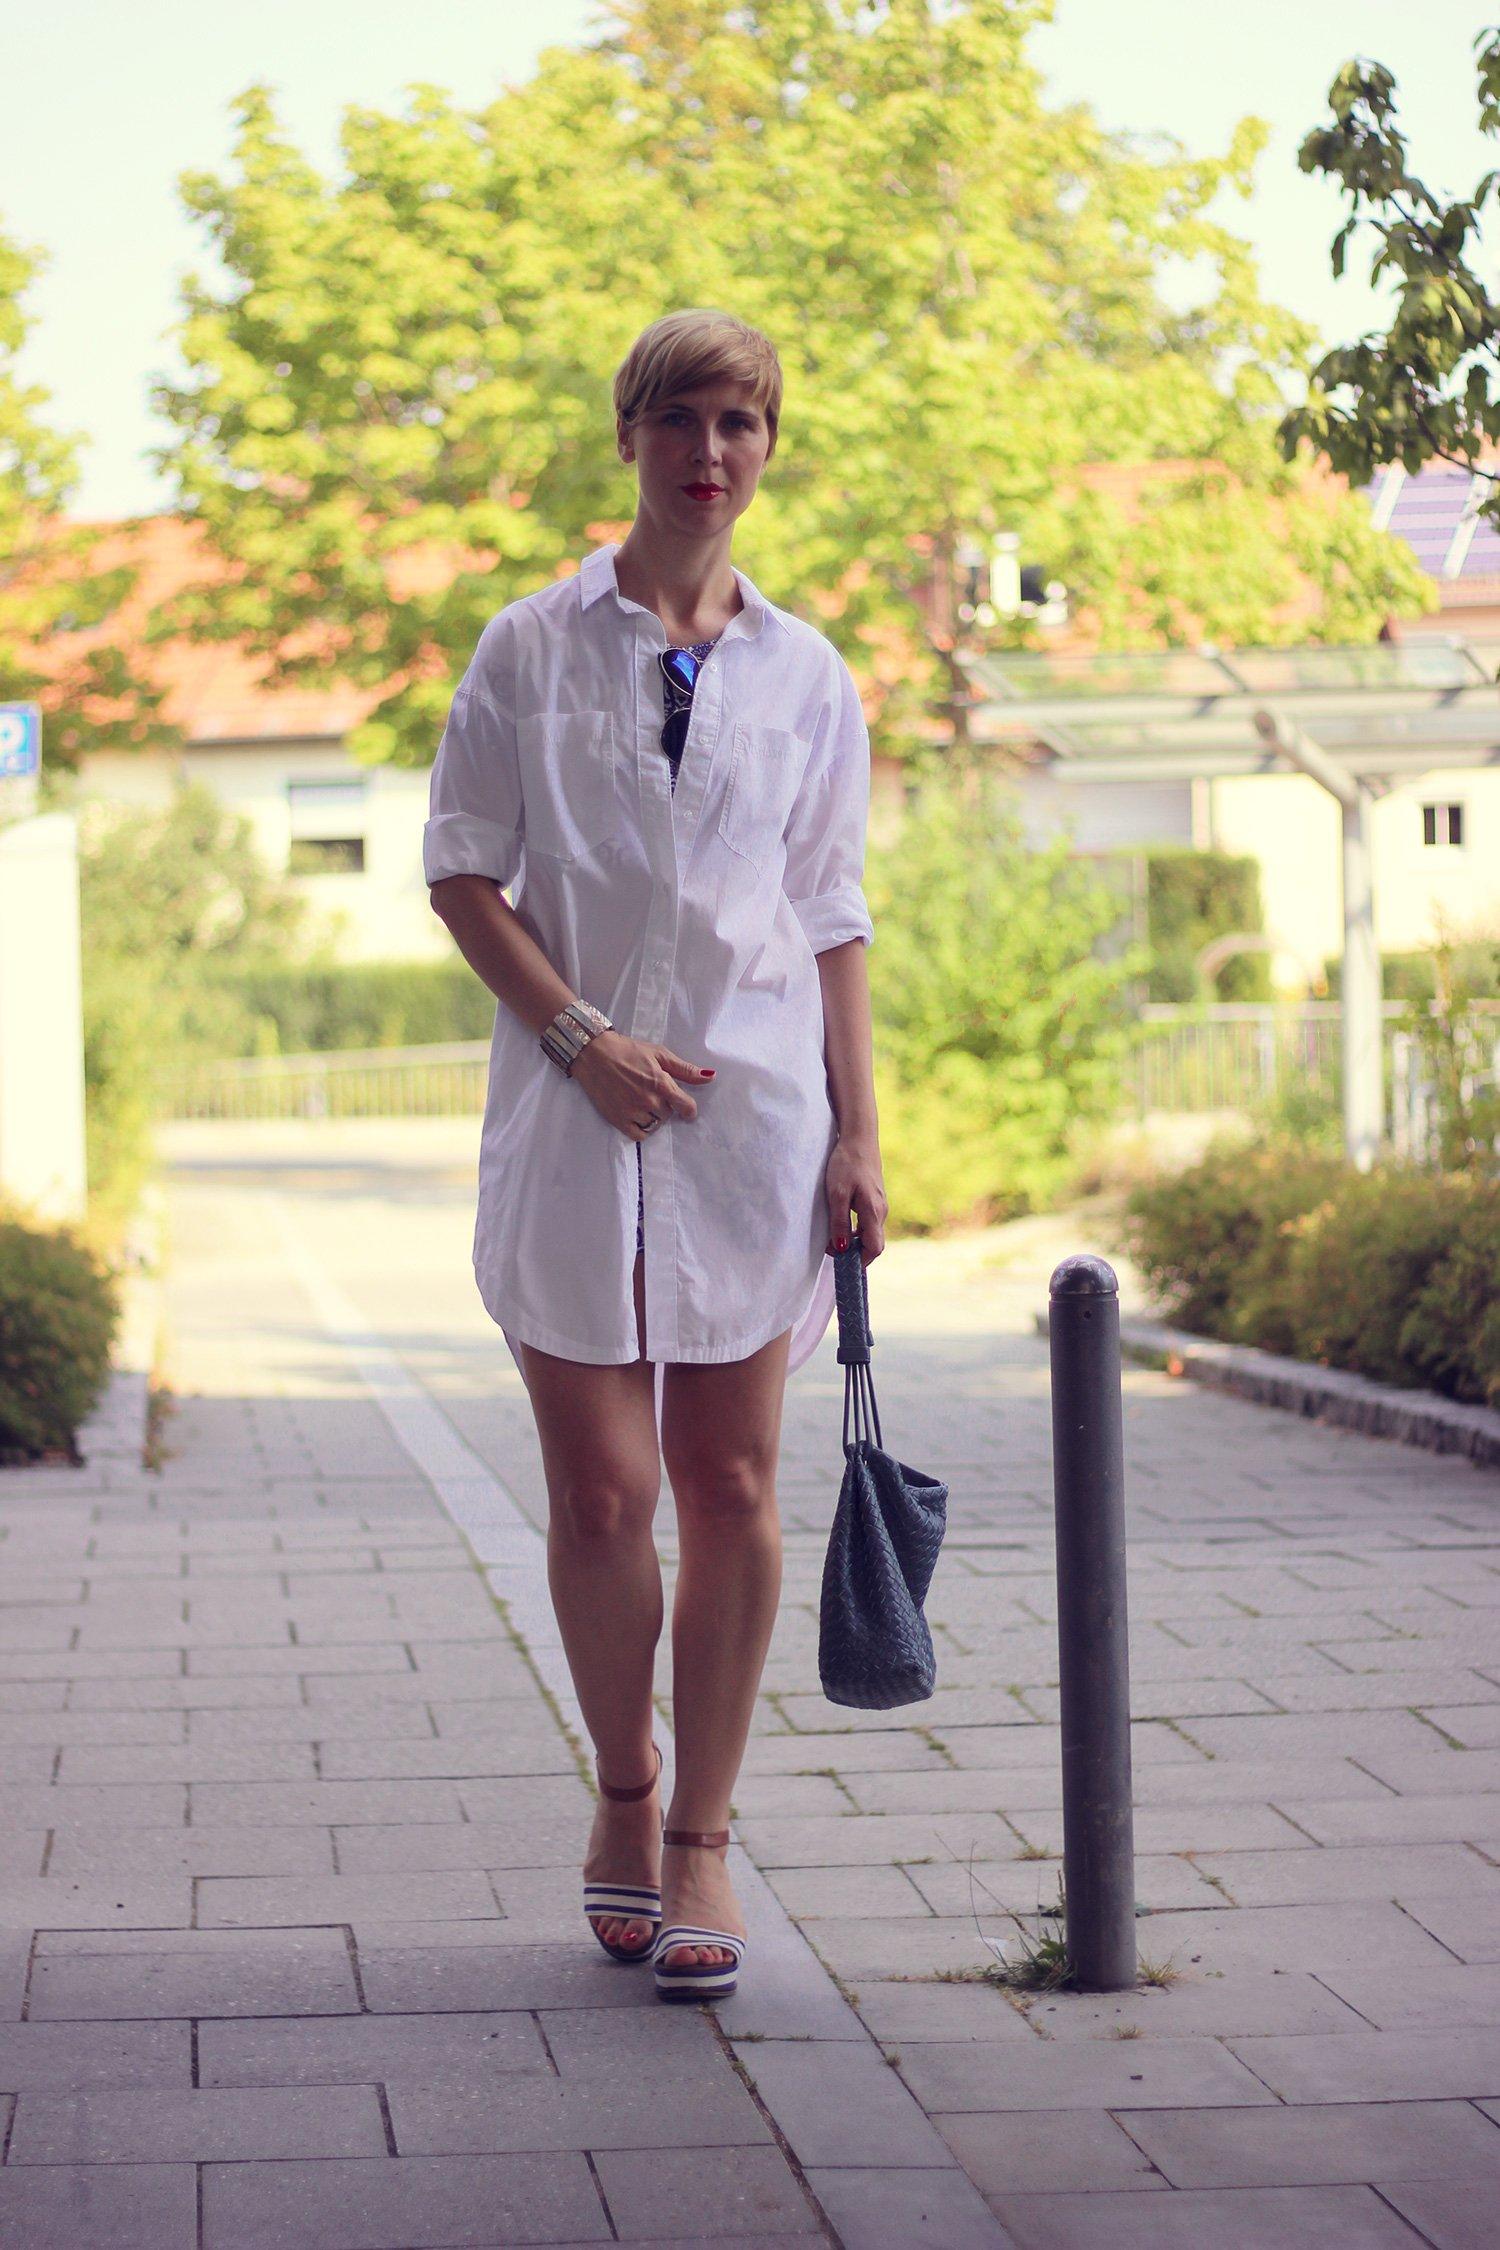 IMG_9629a_Zweiteiler_shorts_blusenkleid_H&M_Blue_Blau_AHemadundaHos_40+style_Fashionoverforty